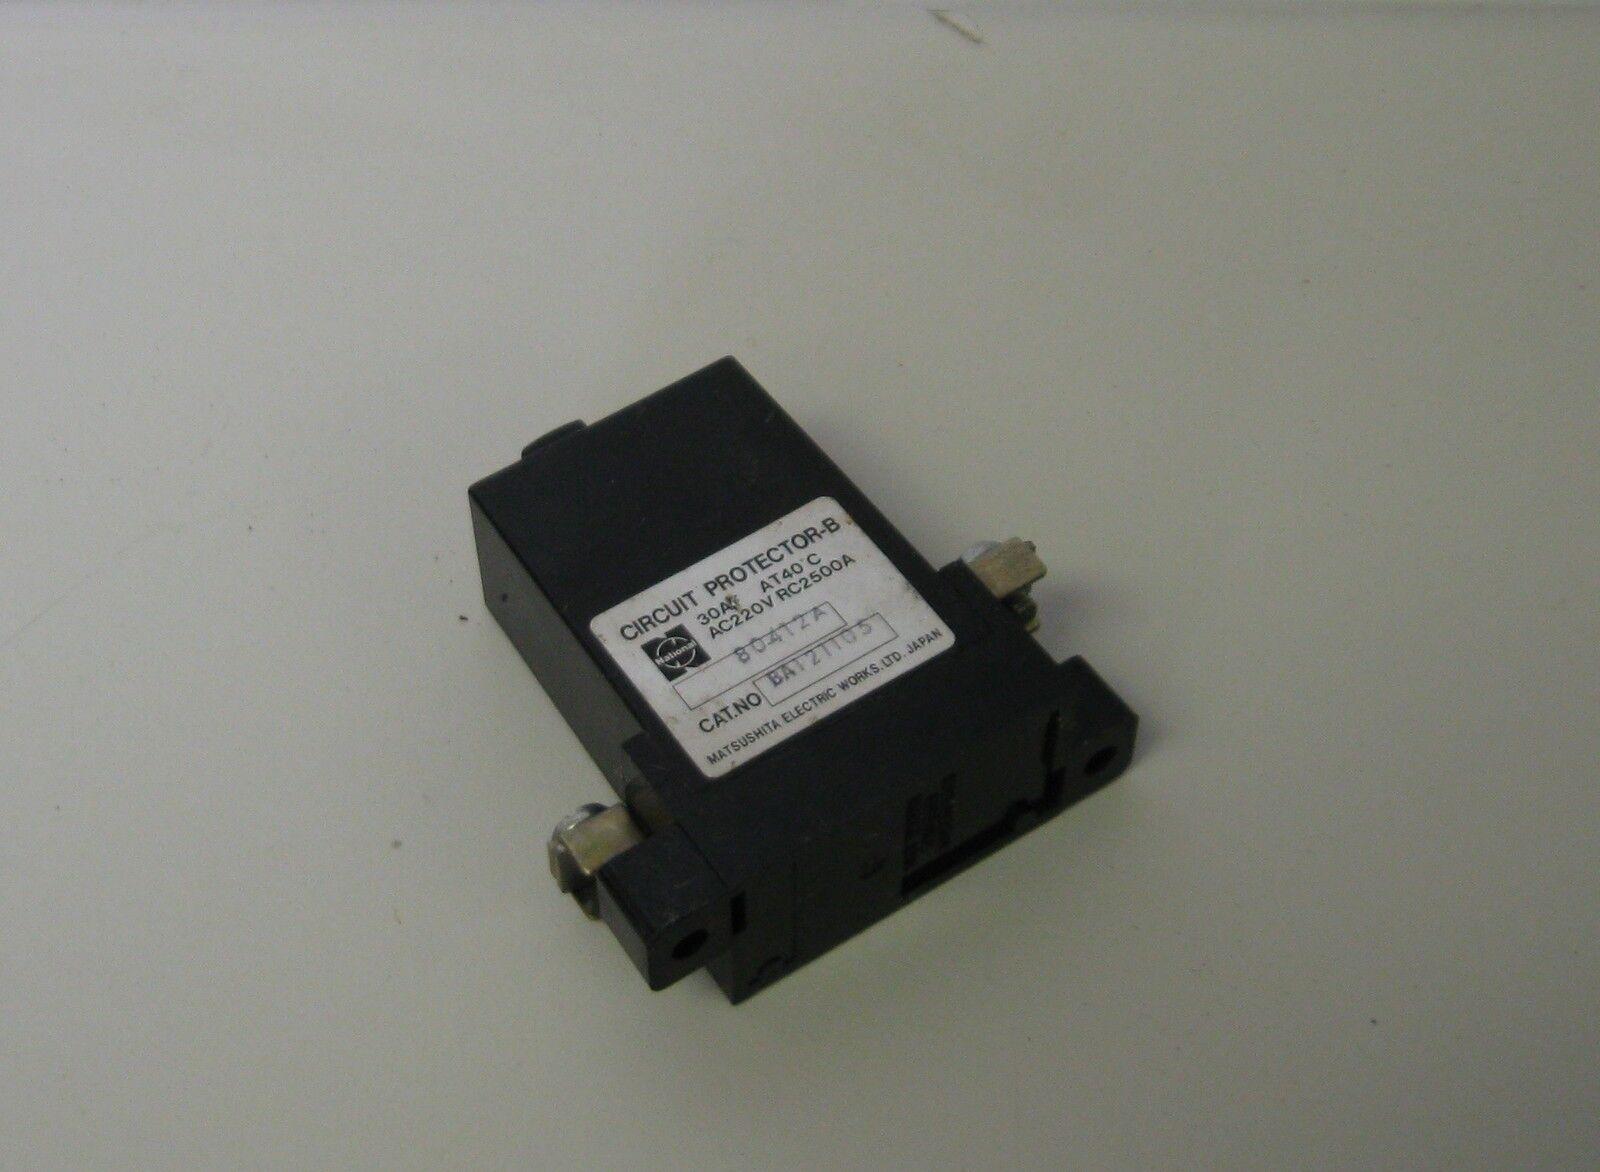 Matsushita Circuit Protector, B12 Warranty BA121105 1A Used